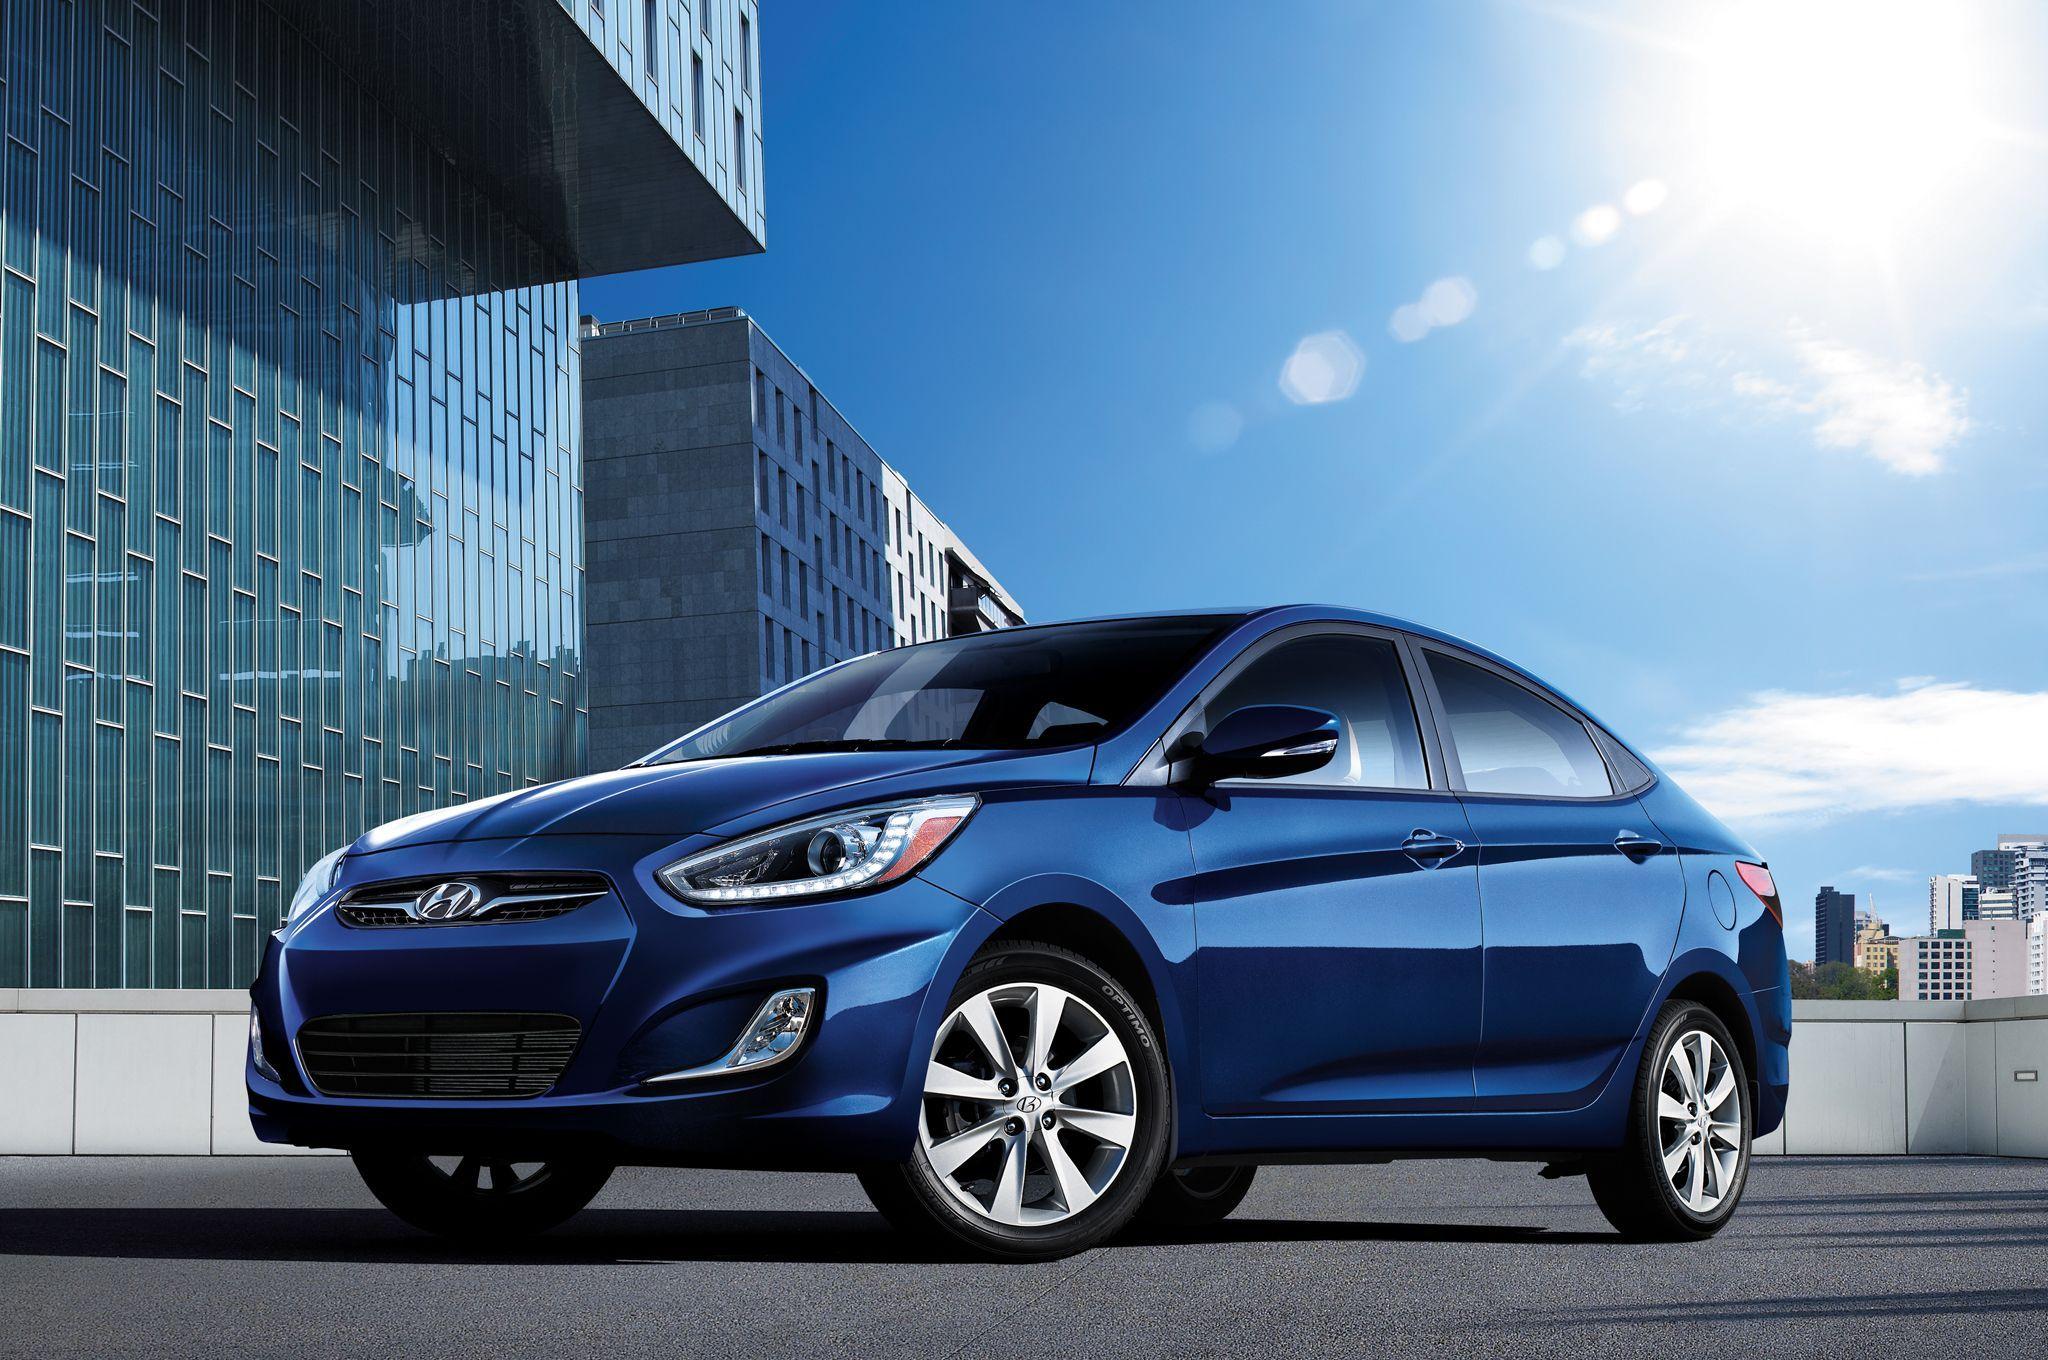 Hyundai Accent Wallpaper Di 2020